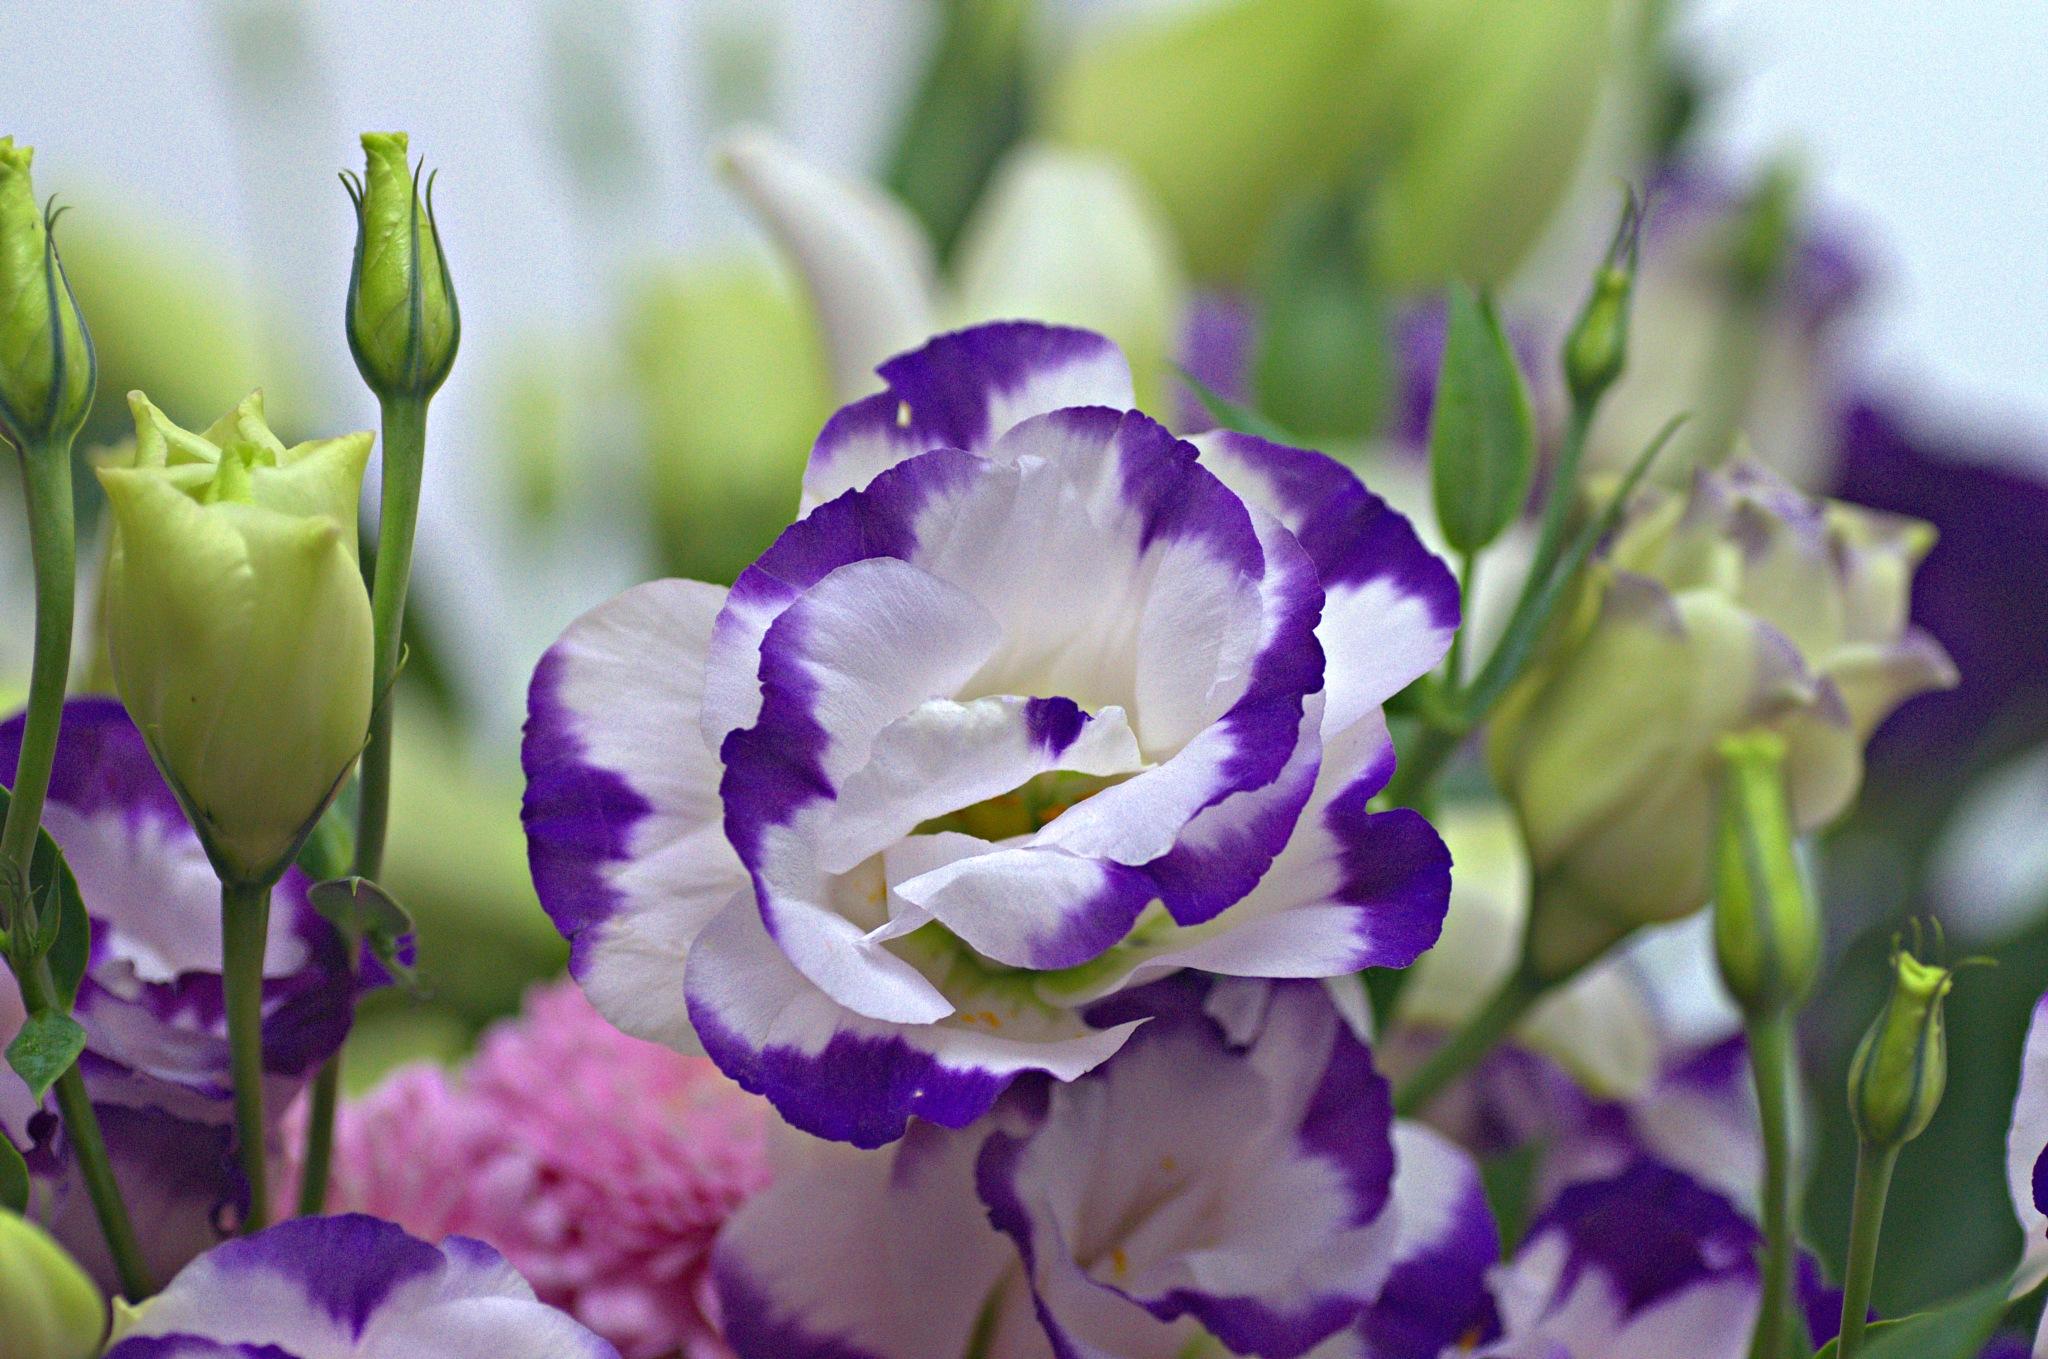 Lots of Flowers by EdwardStern